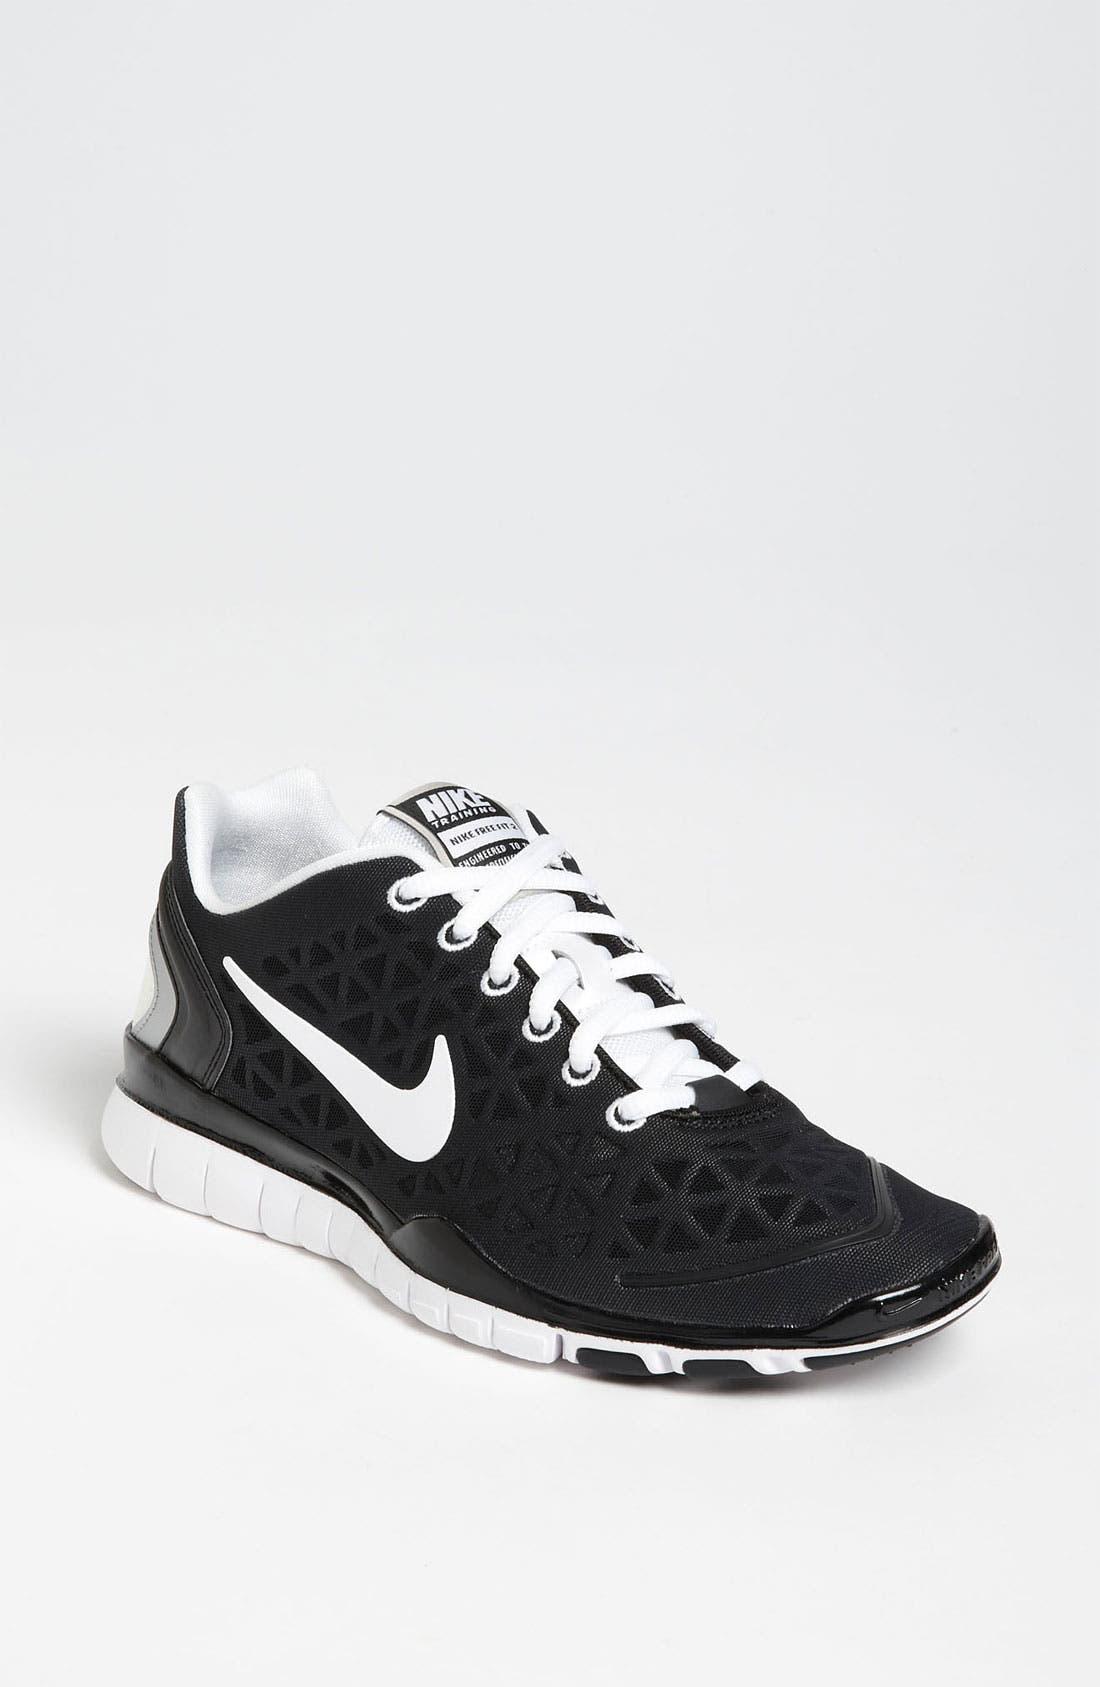 Main Image - Nike 'Free TR Fit 2' Training Shoe (Women)